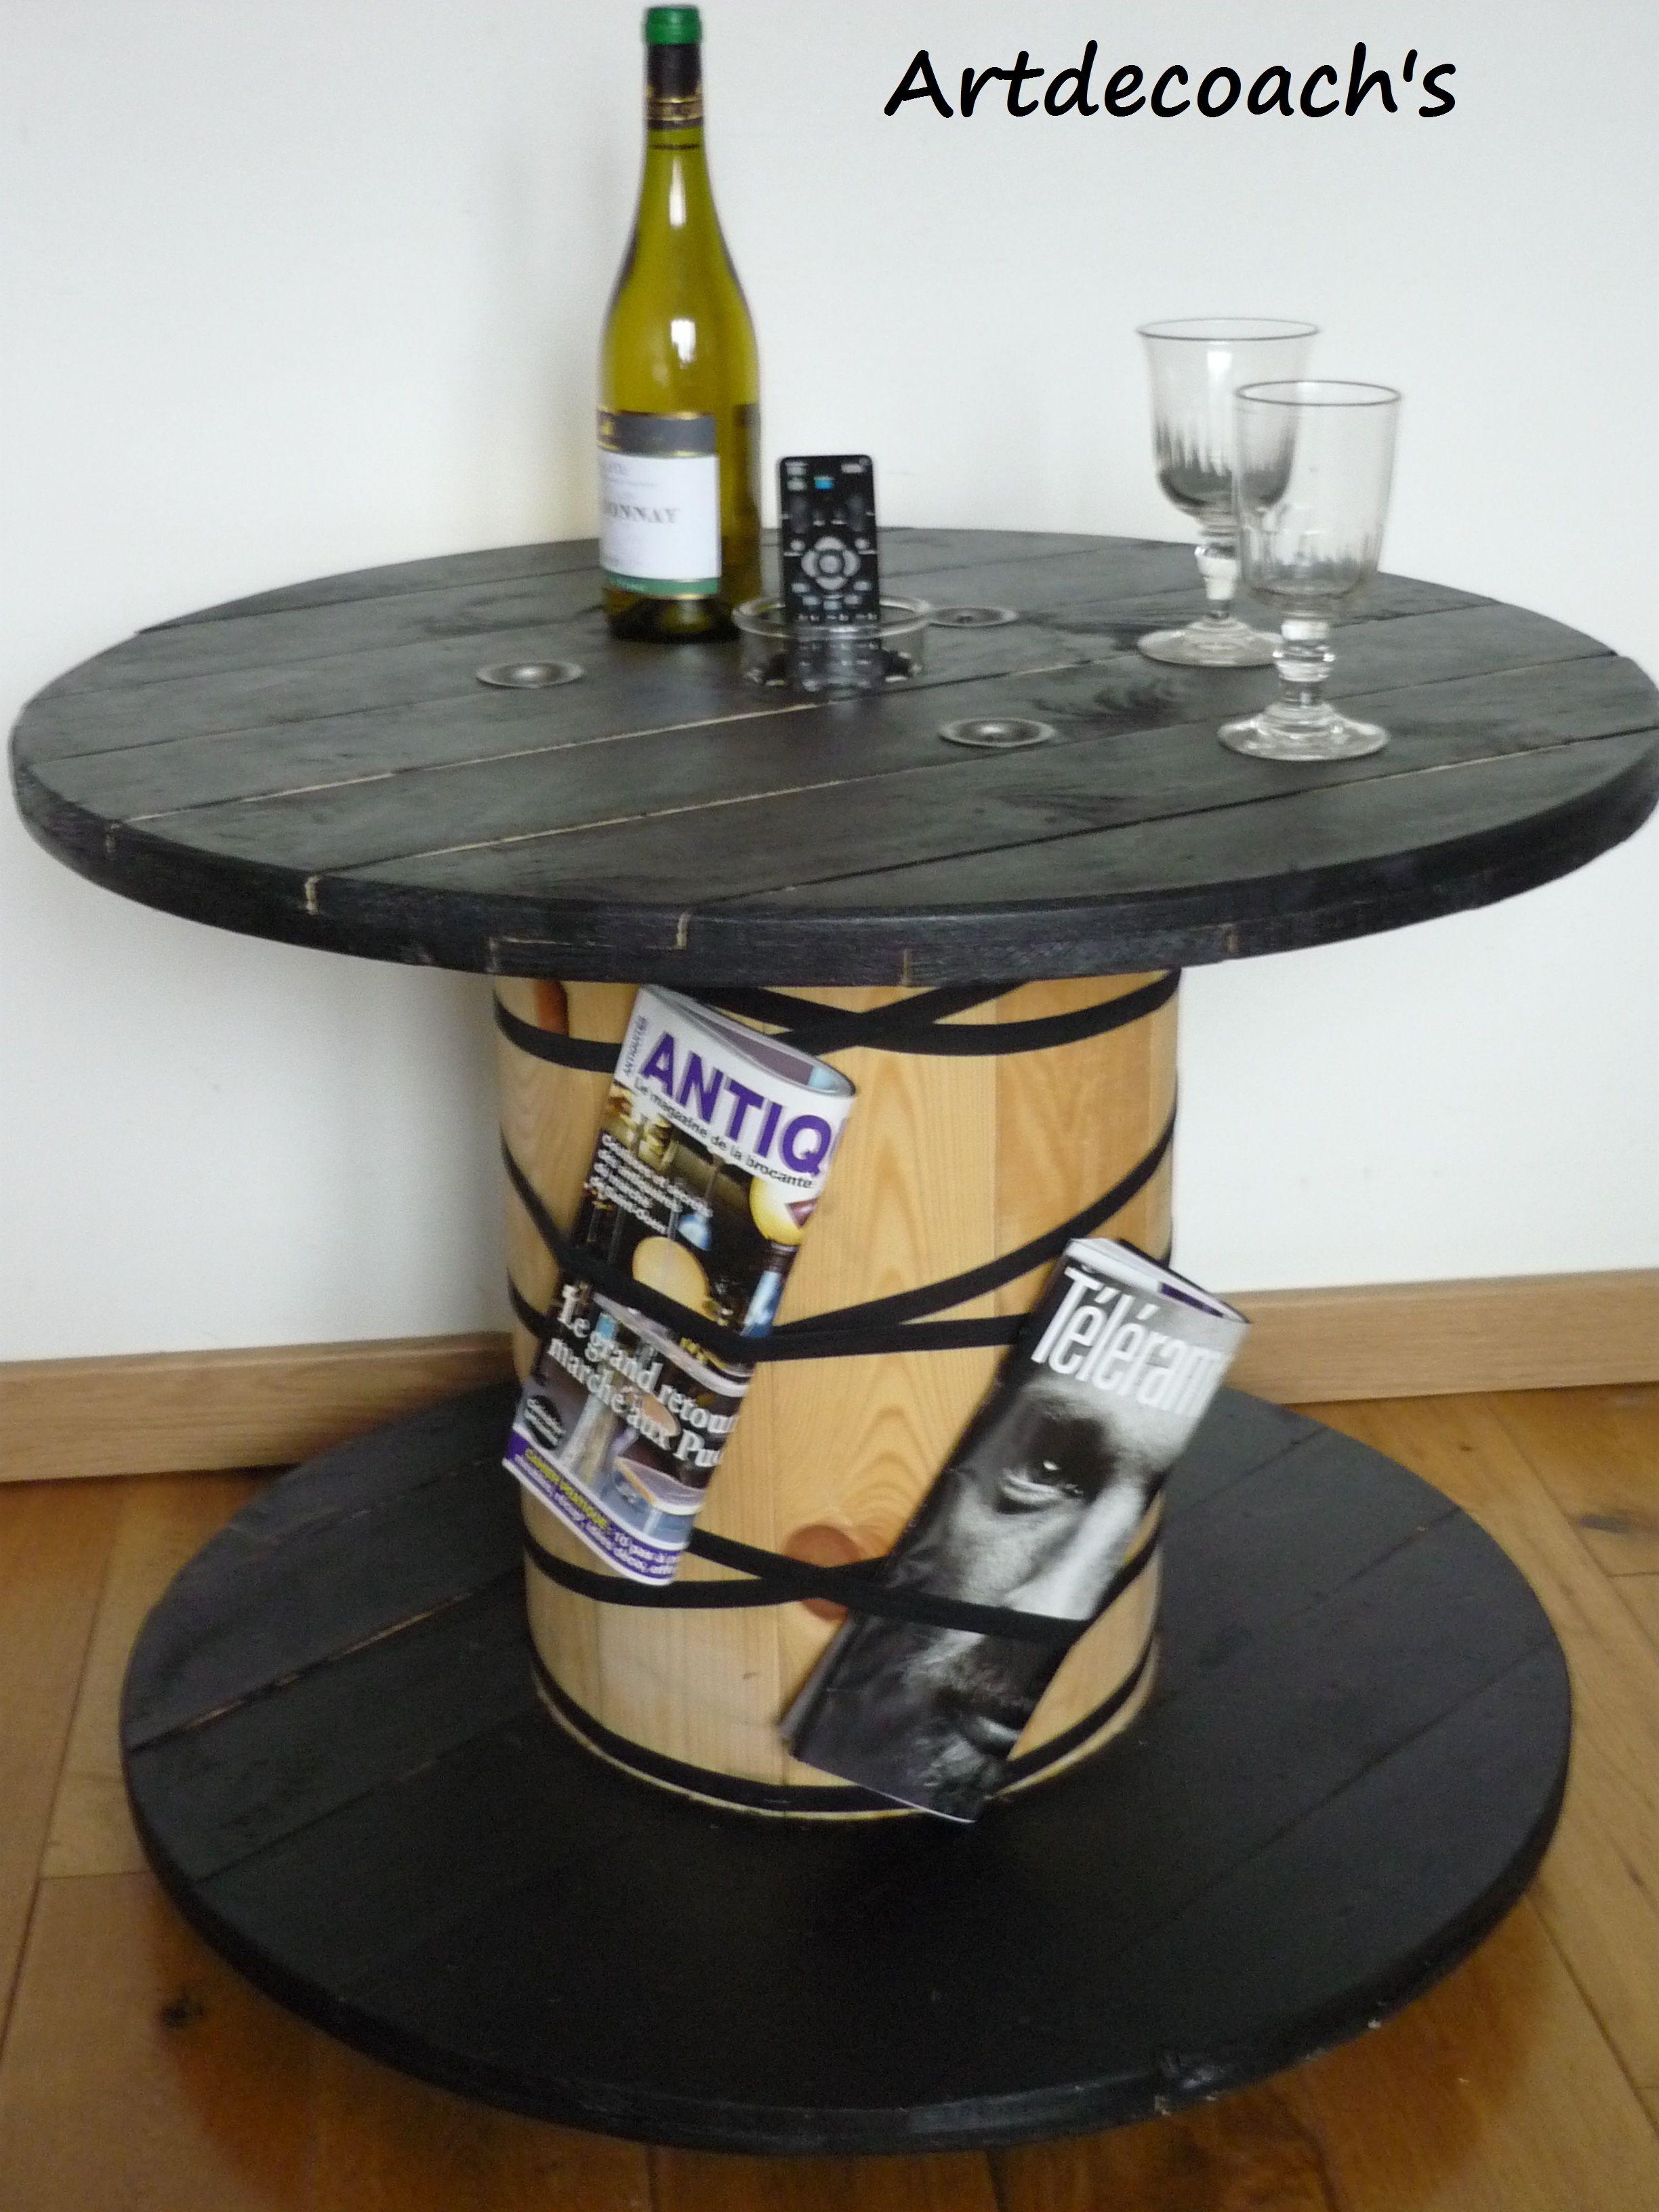 bobine de chantier bobines de cables pinterest bobine chantier et bobines de laine. Black Bedroom Furniture Sets. Home Design Ideas